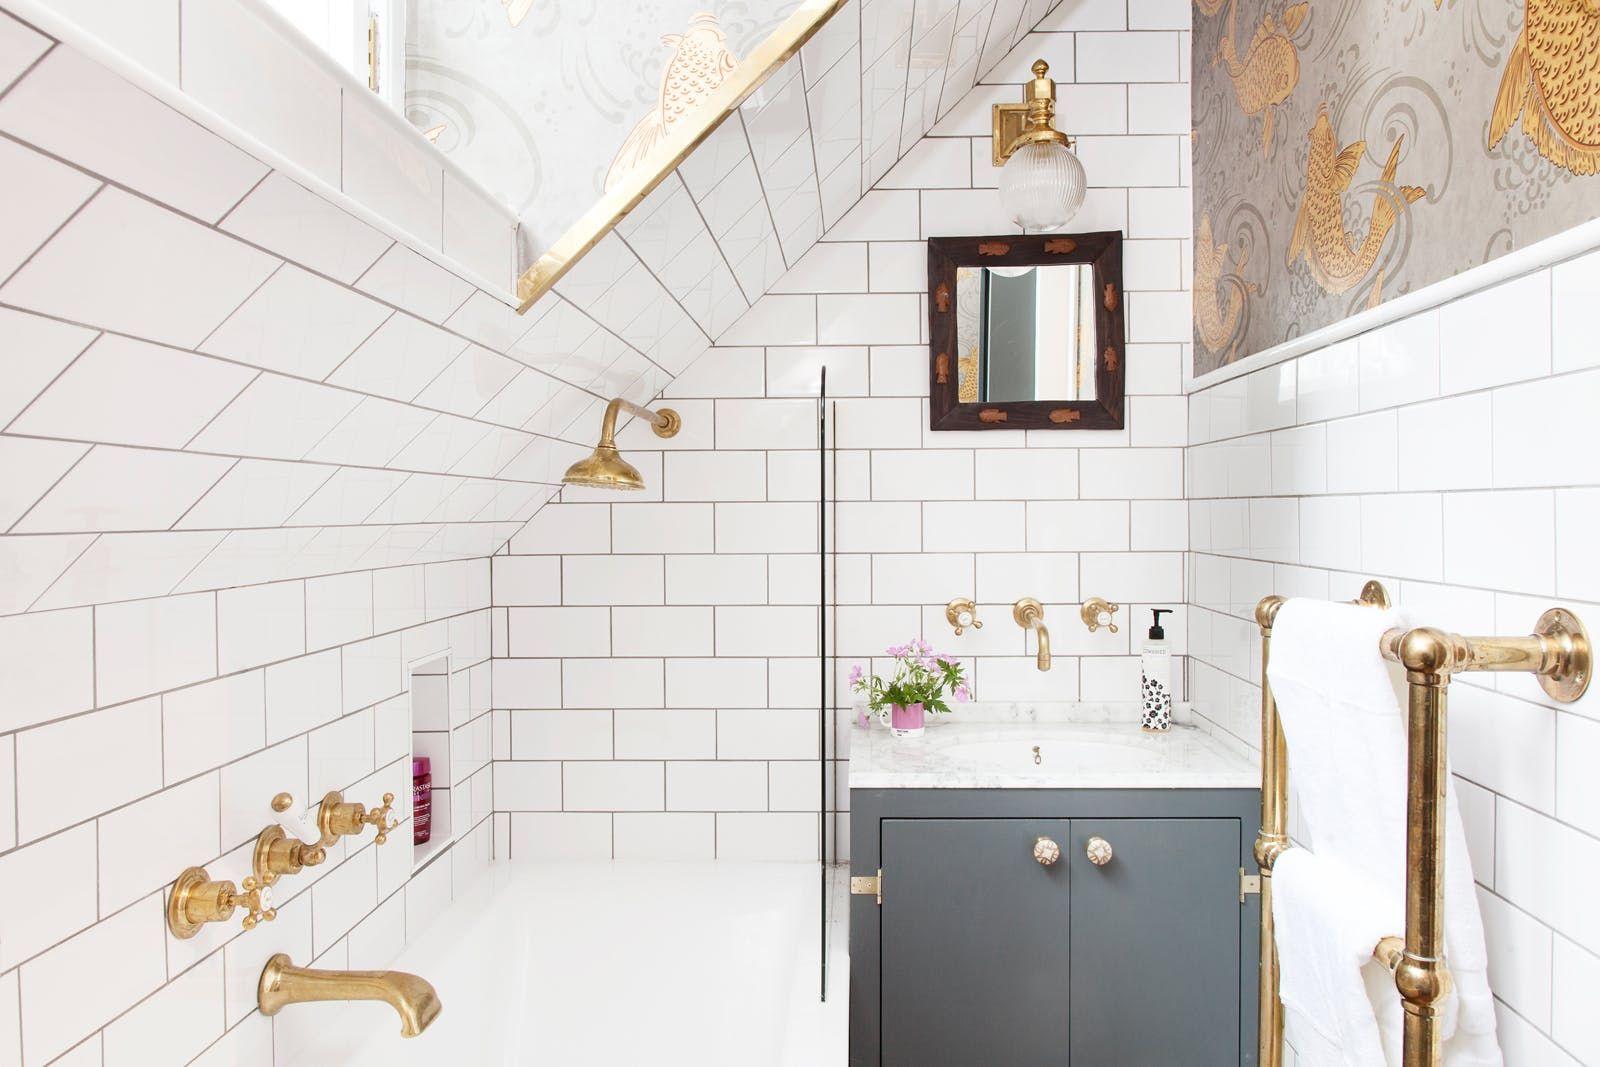 Tour a Fun, Fabulous, Pink & Patterned Edinburgh Home | Subway tiles ...